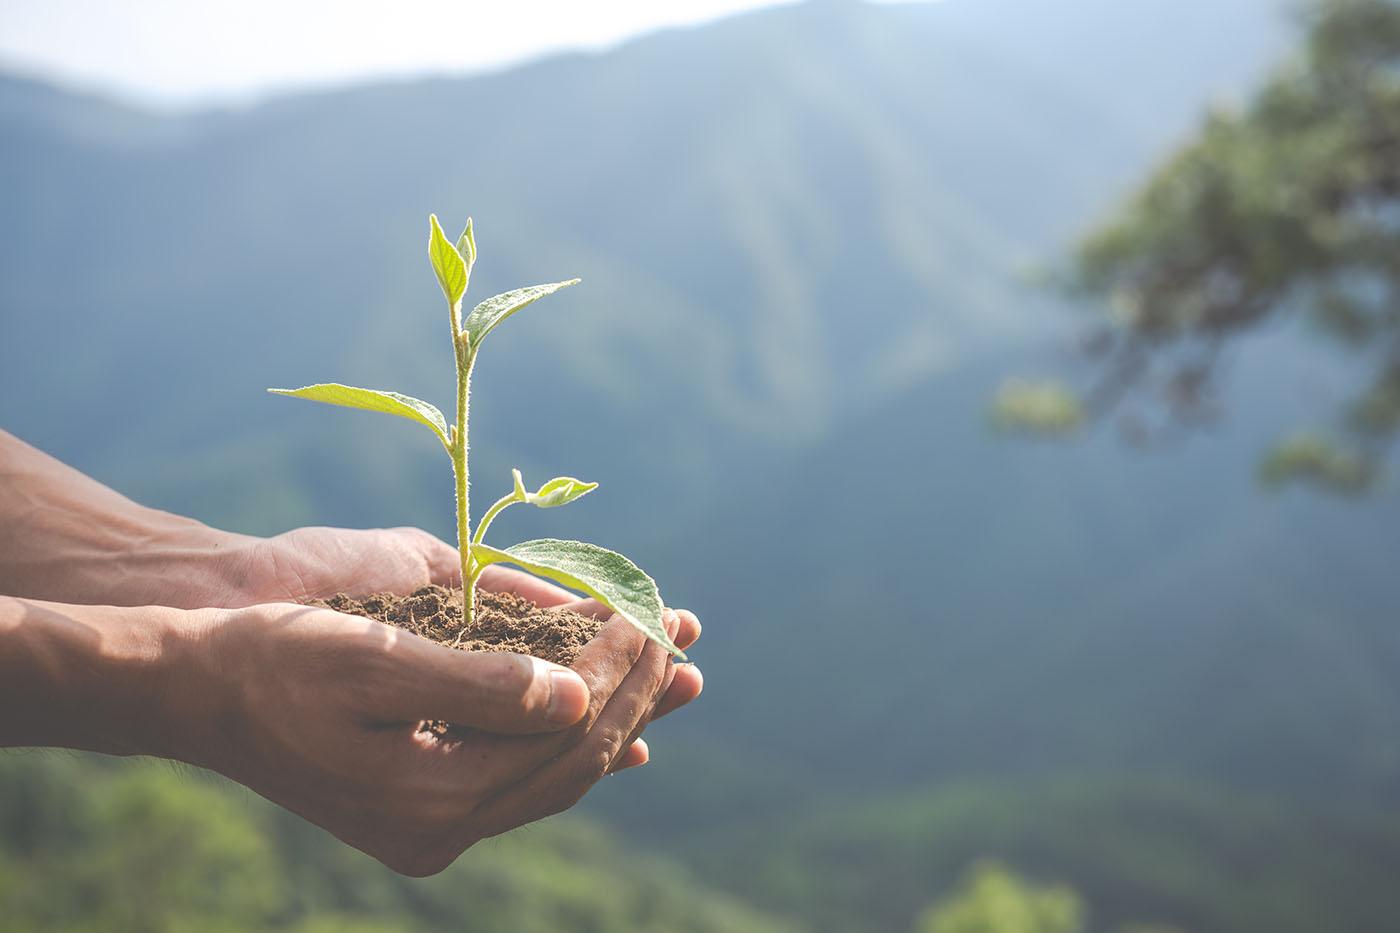 Agroecologia: Conceitos